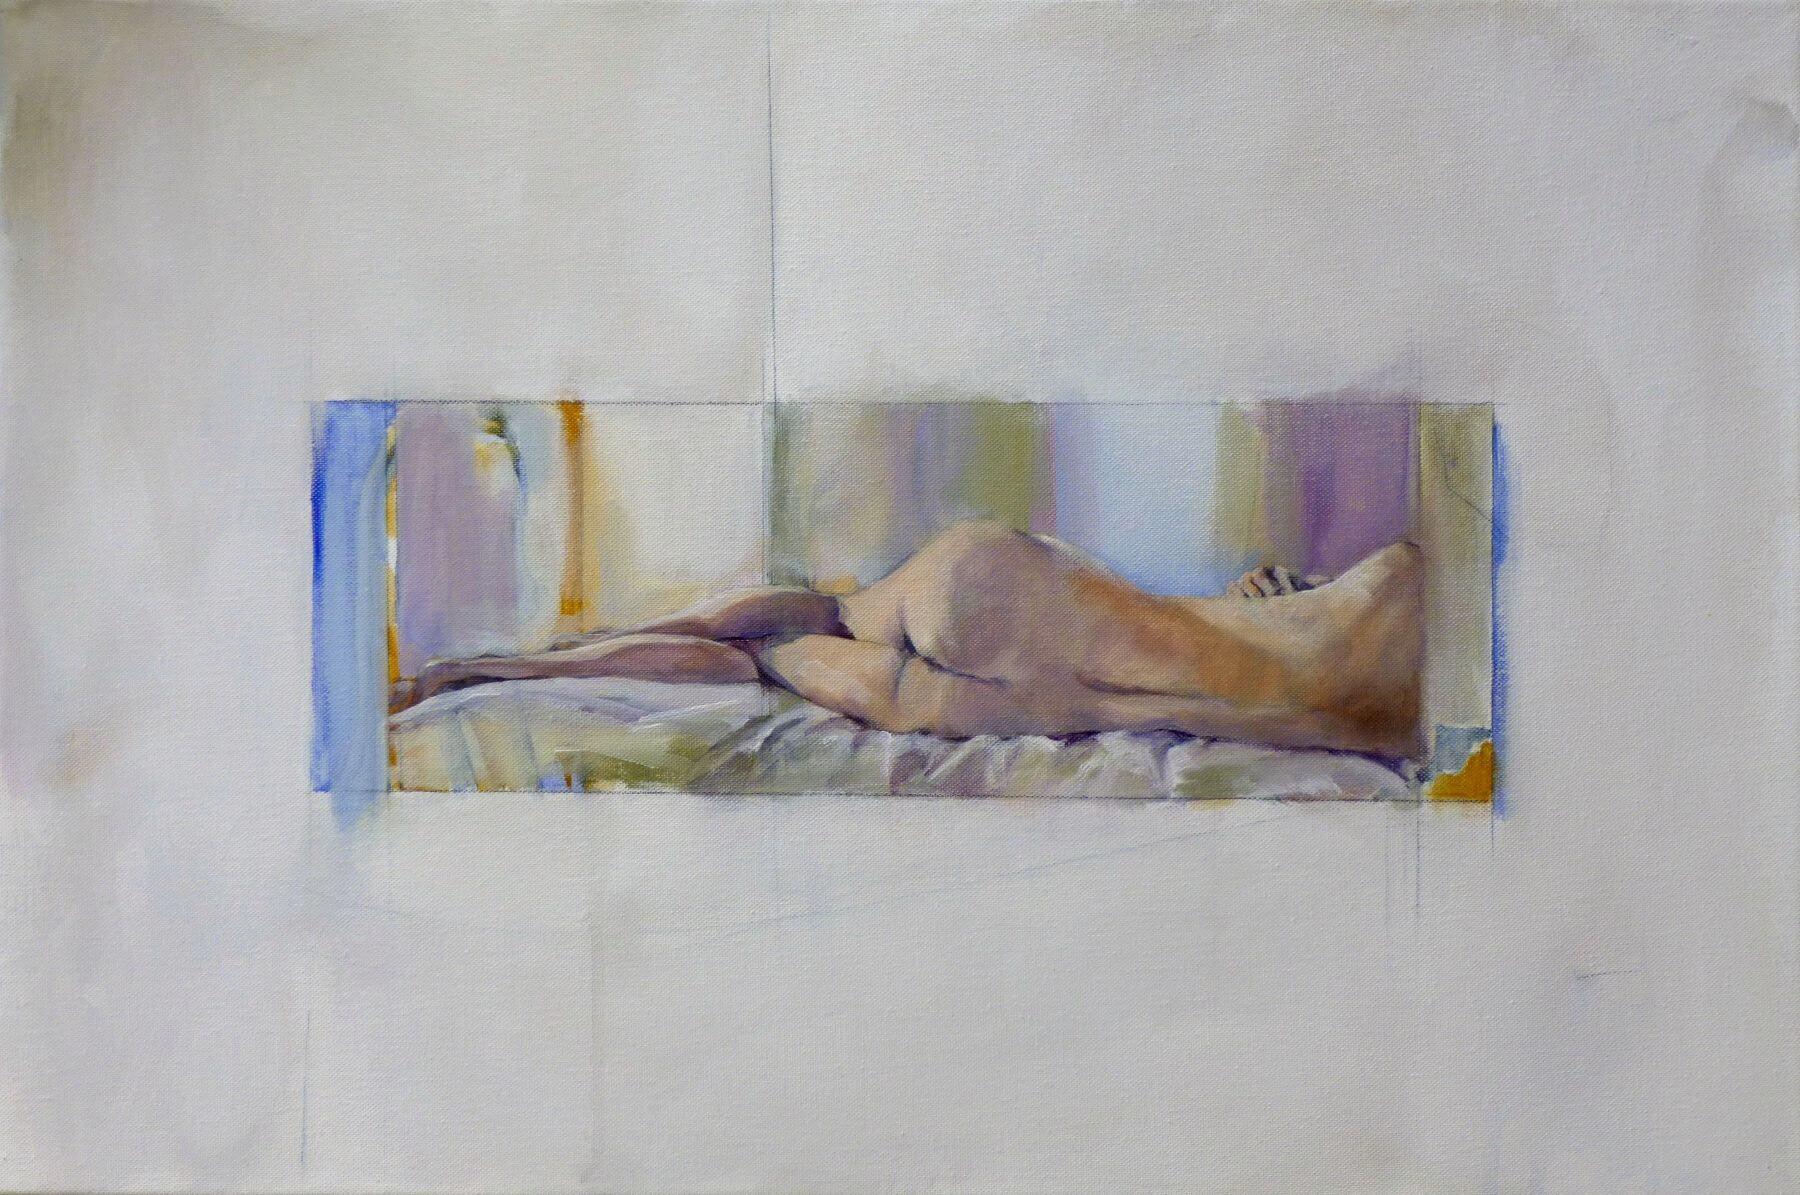 Memento - painting, acrylic on canvas by artist Neva Bergemann